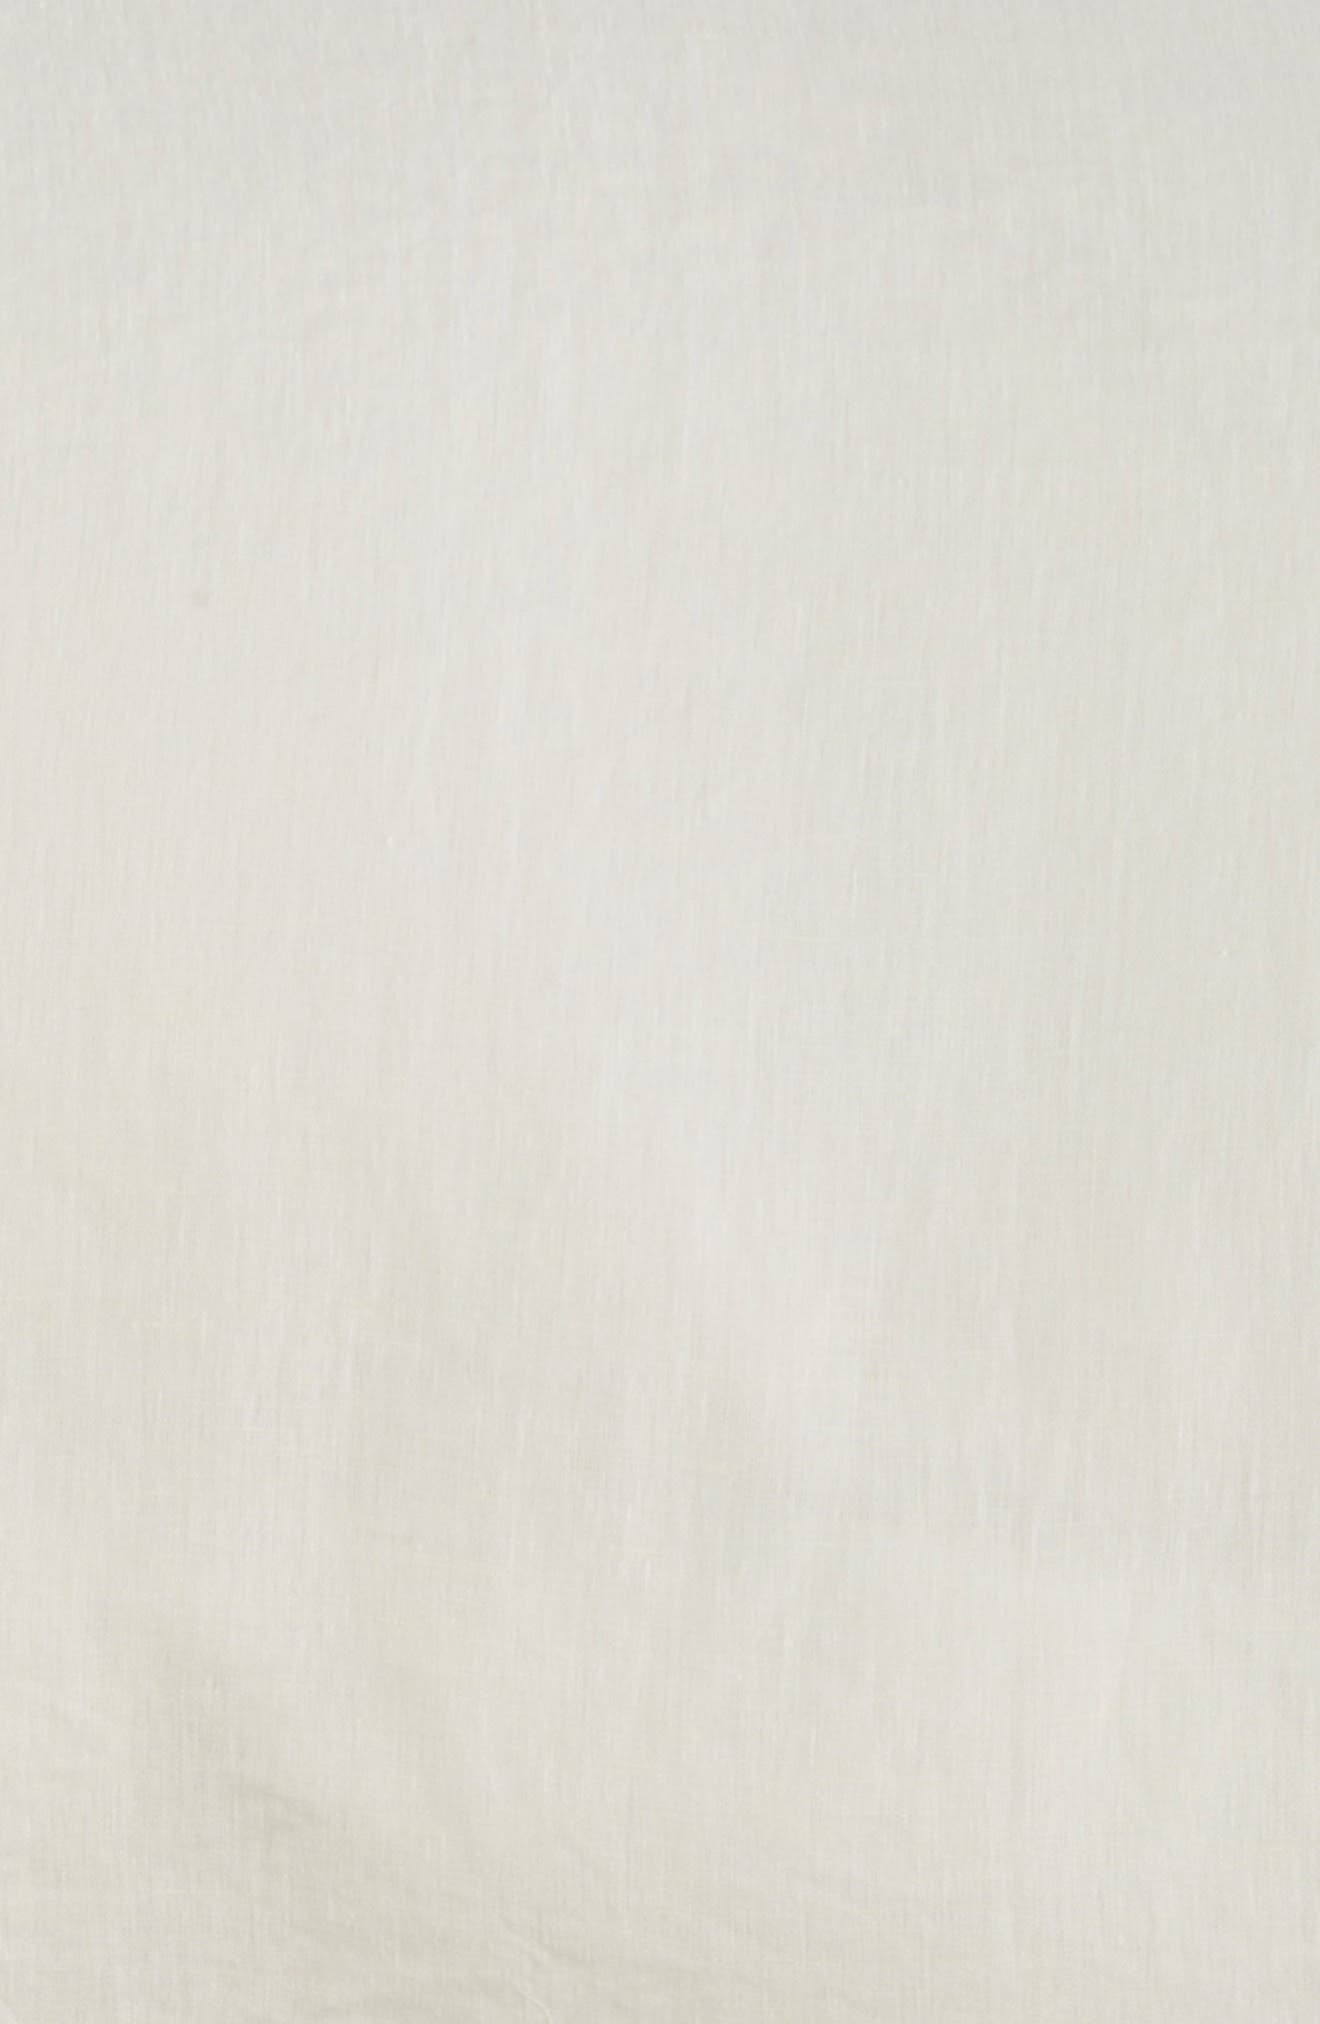 Solo 580 Thread Count Linen Duvet Cover,                             Alternate thumbnail 3, color,                             Anvil